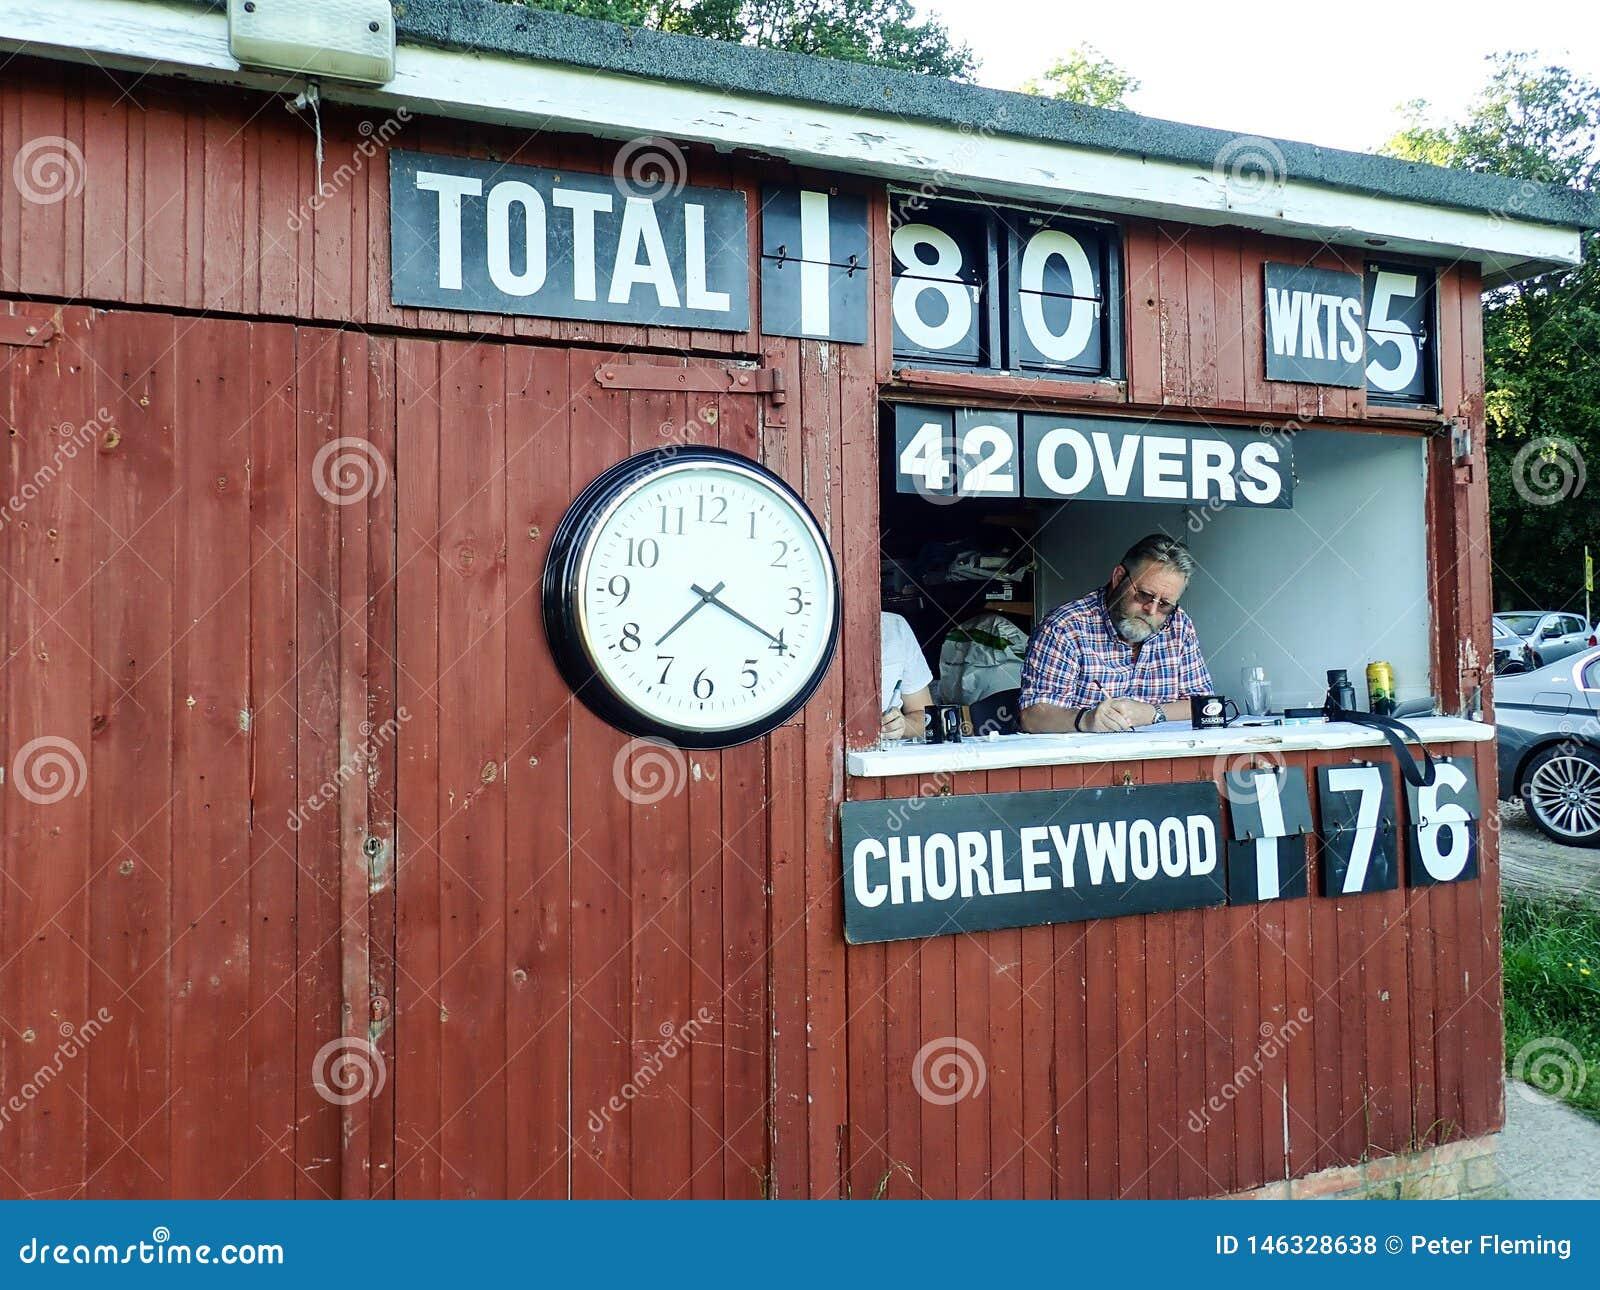 Scoring shed at Saturday match at Chorleywood Cricket Club, Chorleywood, Hertfordshire, England, United Kingdom